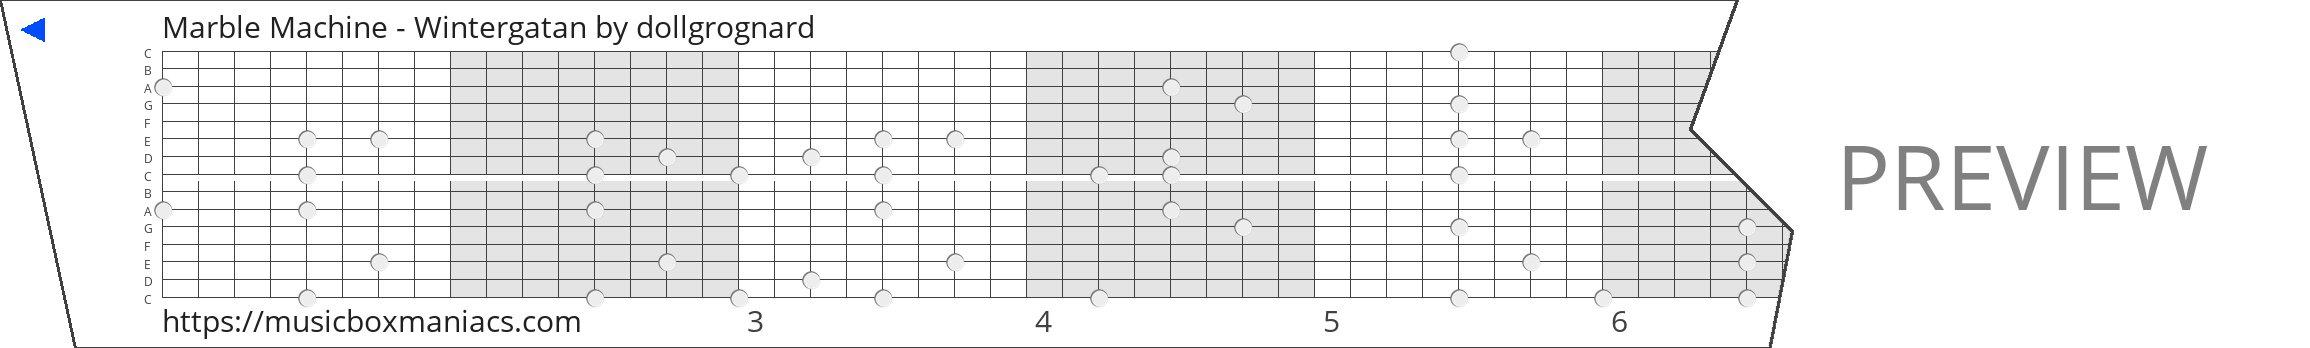 Marble Machine - Wintergatan 15 note music box paper strip